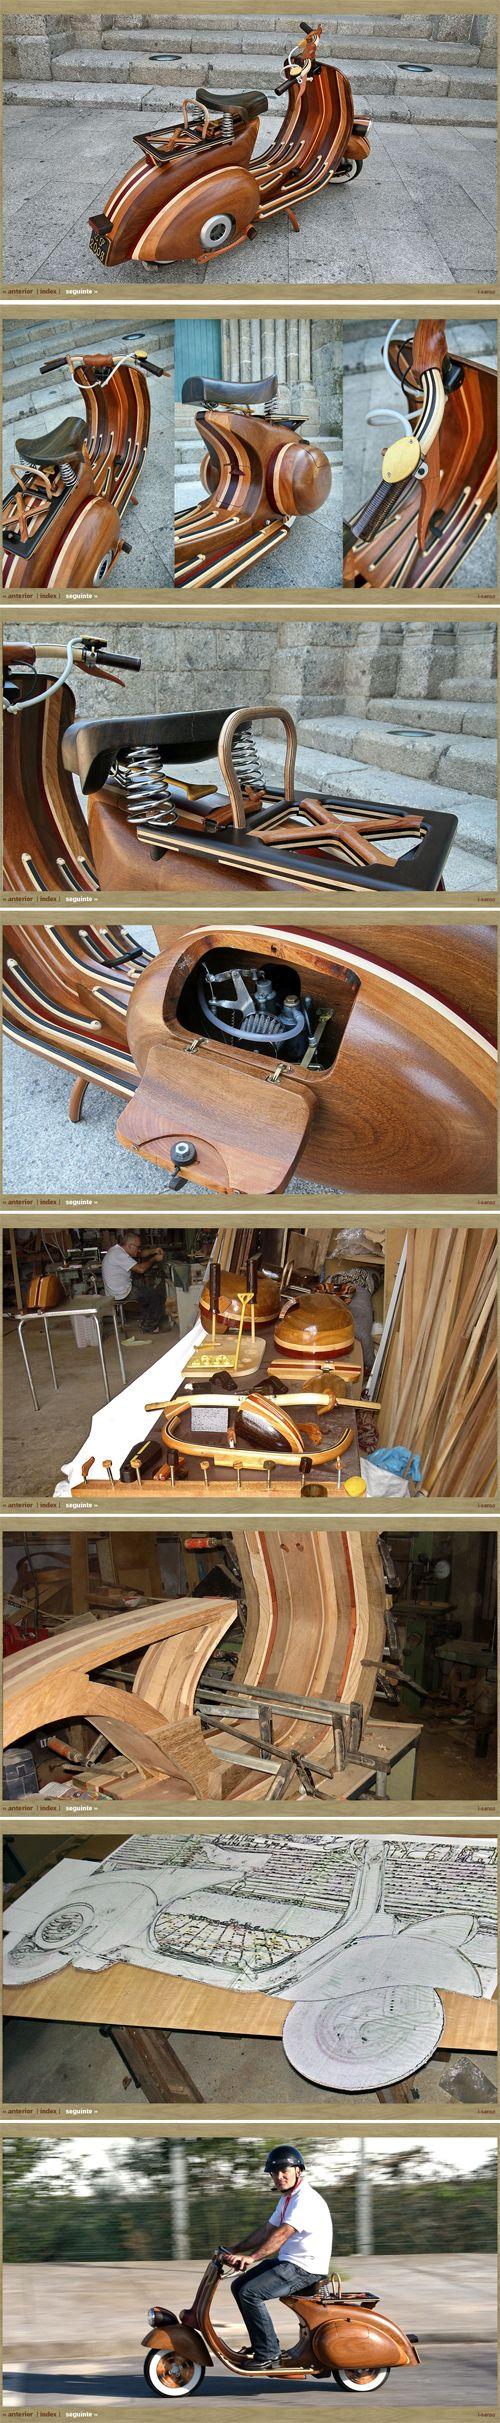 Vespa Daniella was Handmade by a skilled craftsman in Portugal